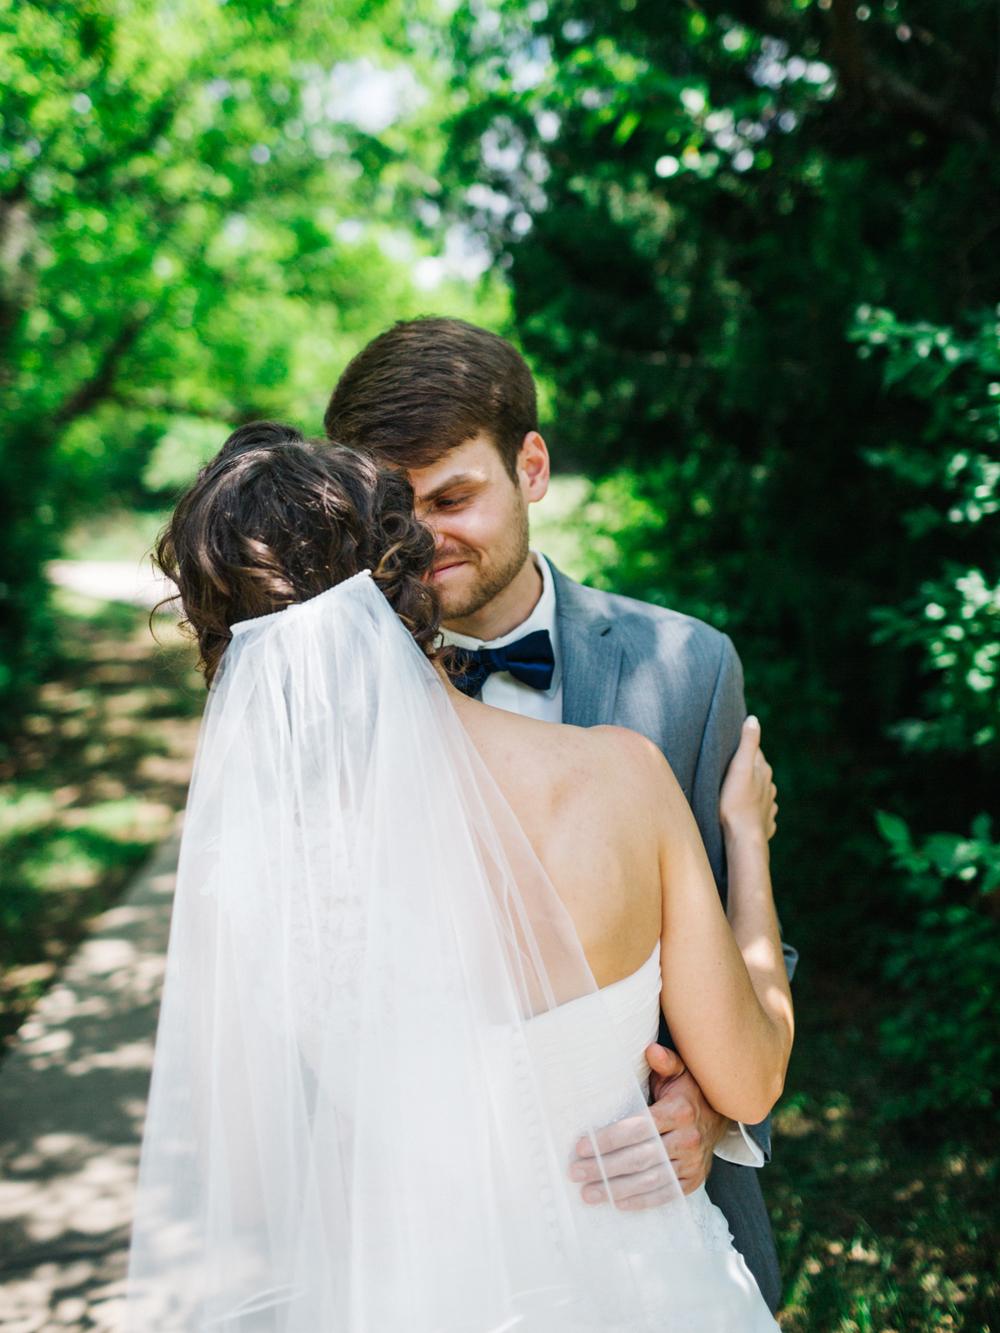 Wichita, Kansas Wedding Photographer - Neal Dieker - Wedding Photography-147.jpg